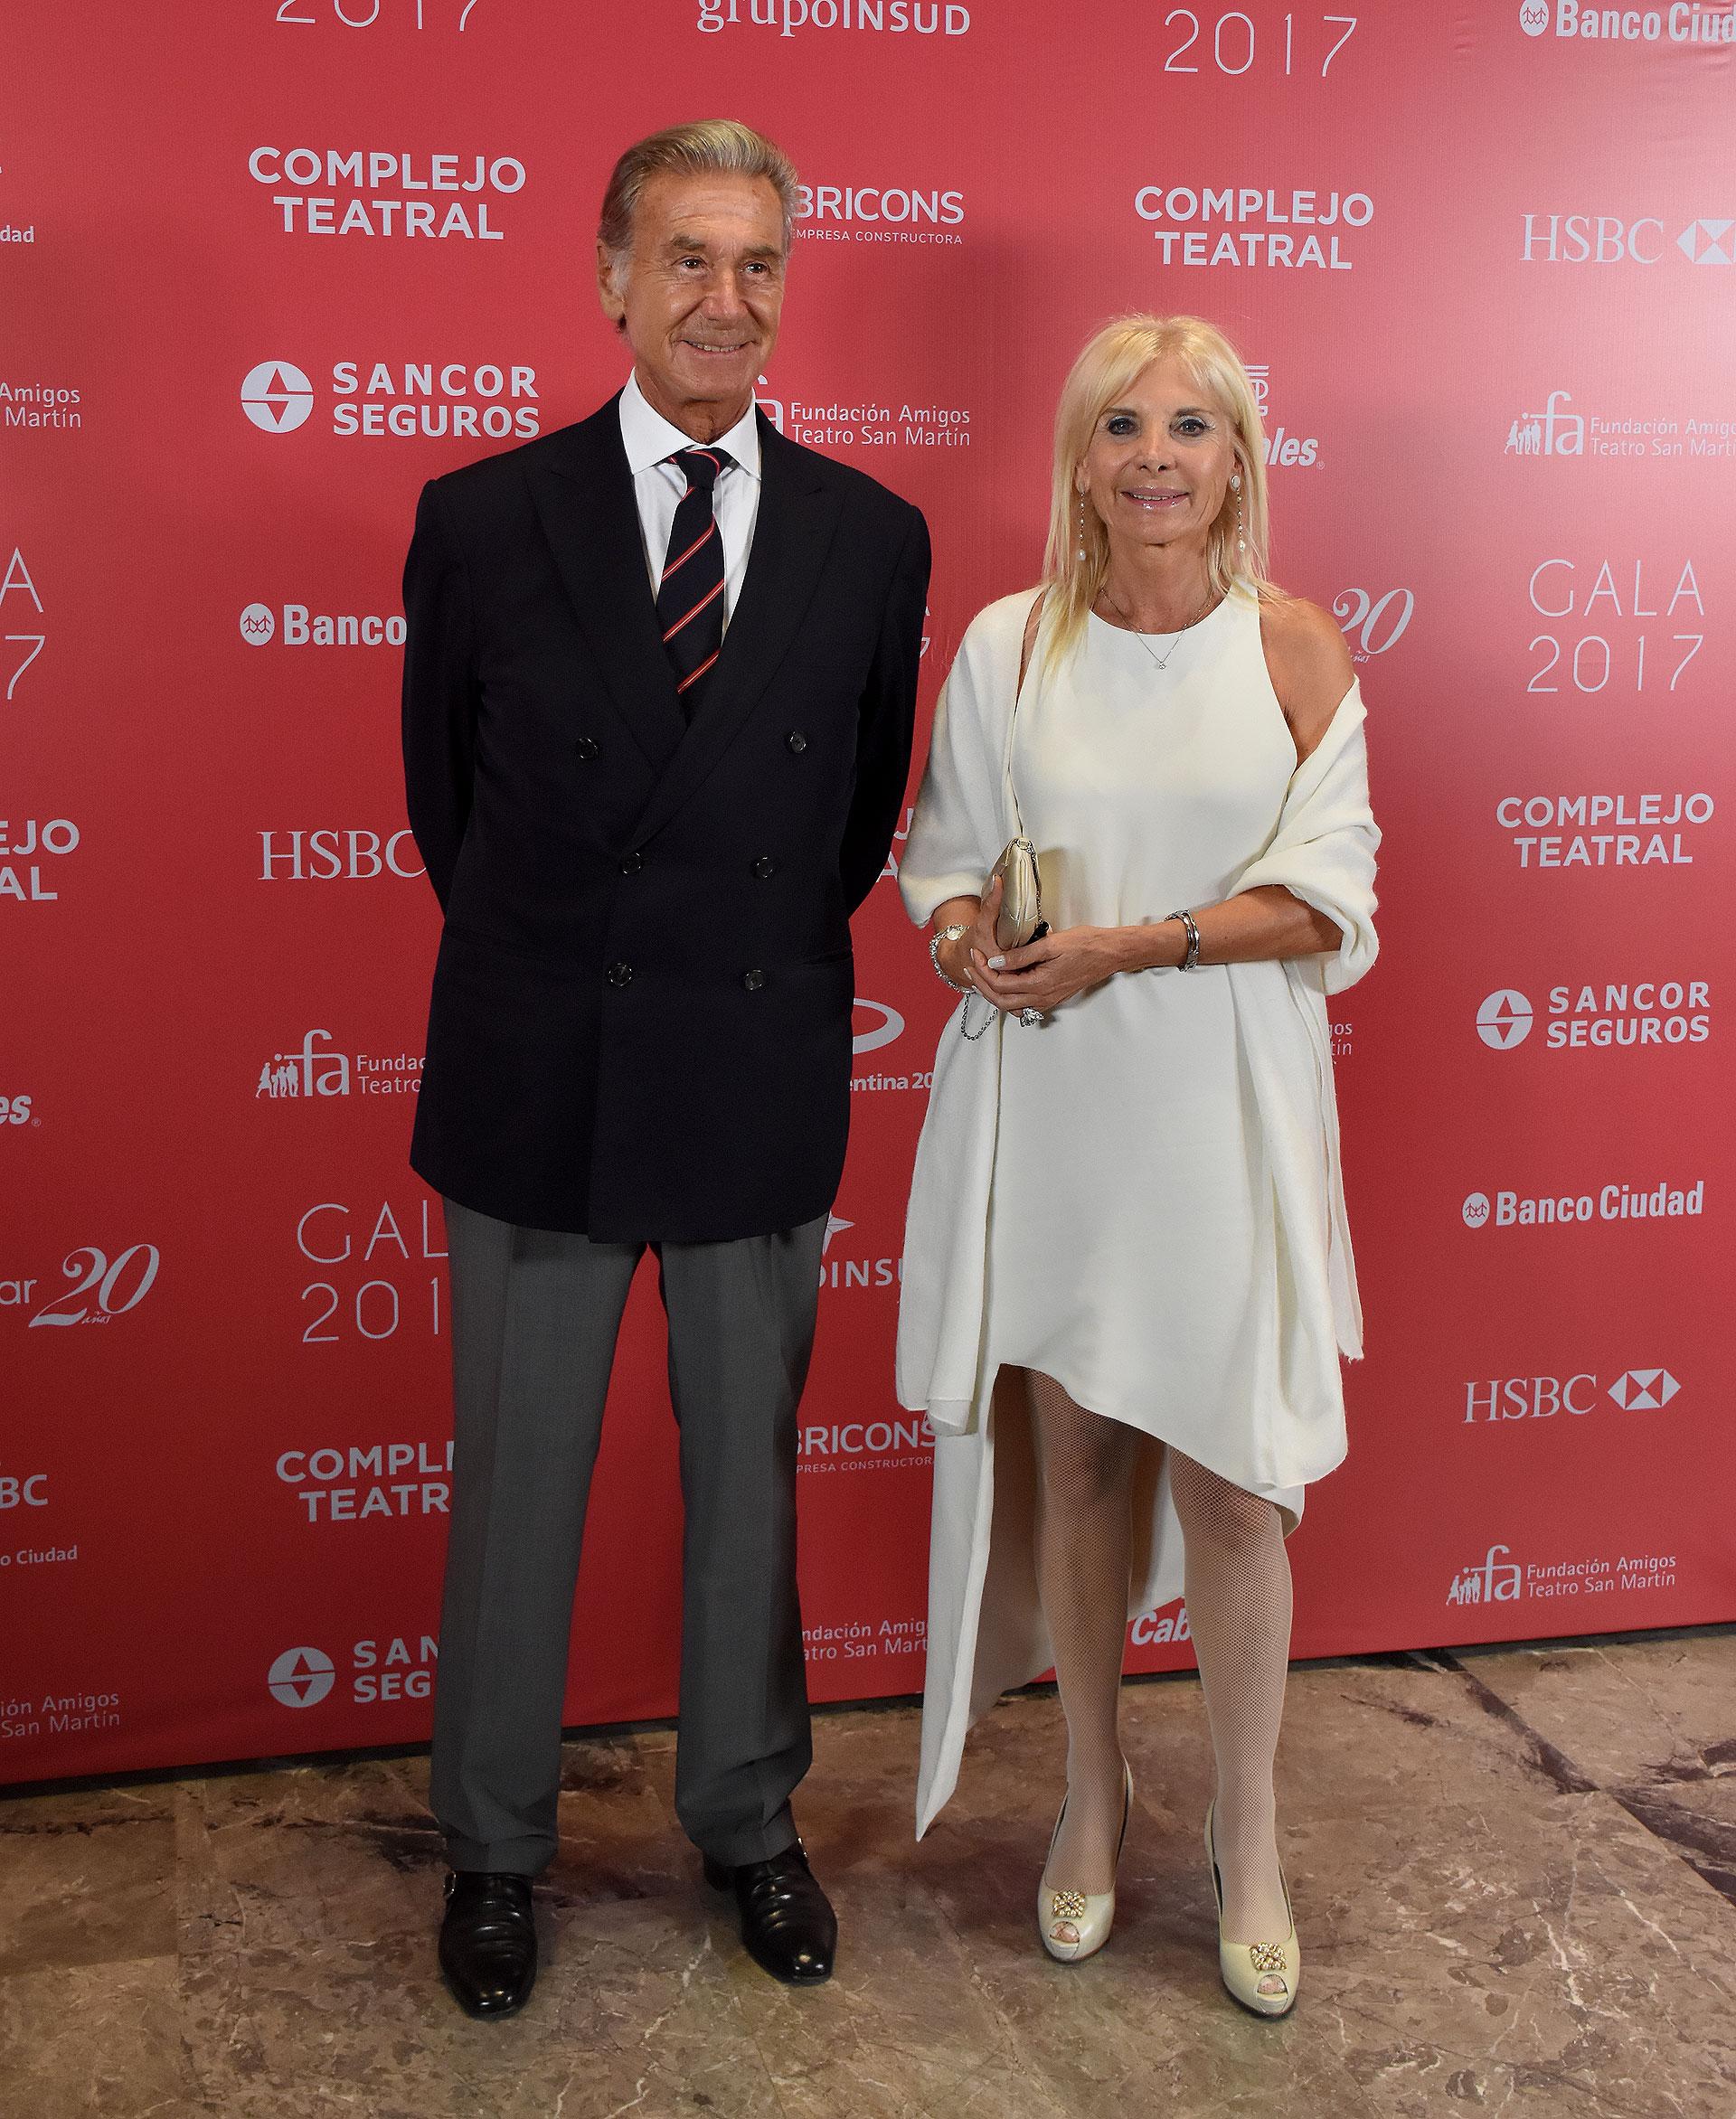 La embajadora de Italia en la Argentina, Teresa Castaldo